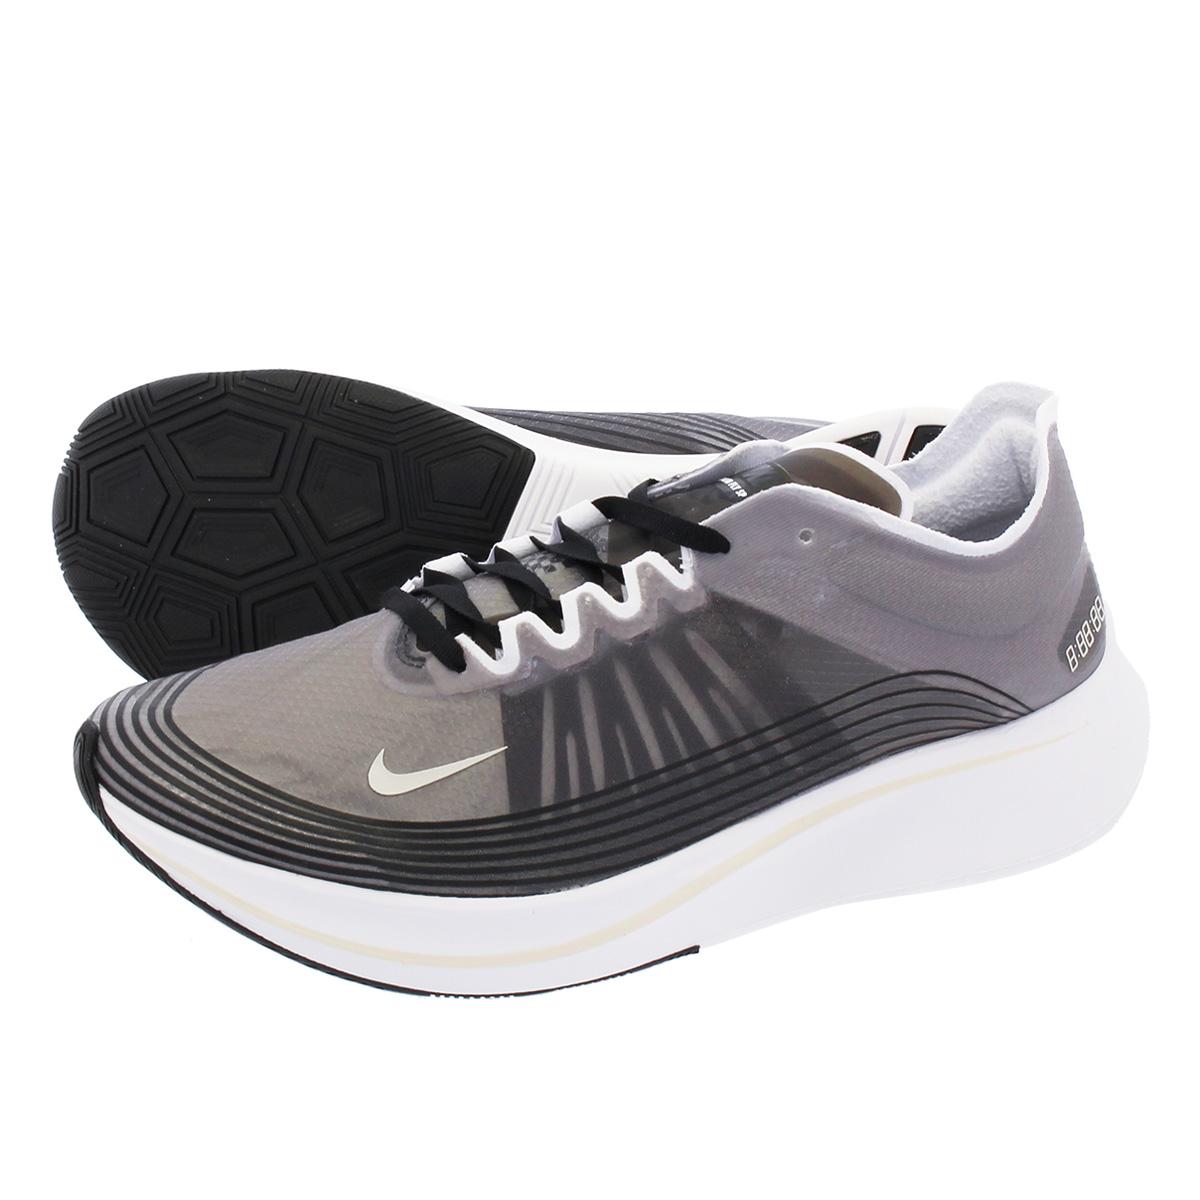 854204e5607 LOWTEX PLUS  NIKE ZOOM FLY SP Nike zoom fly SP BLACK LIGHT BONE ...